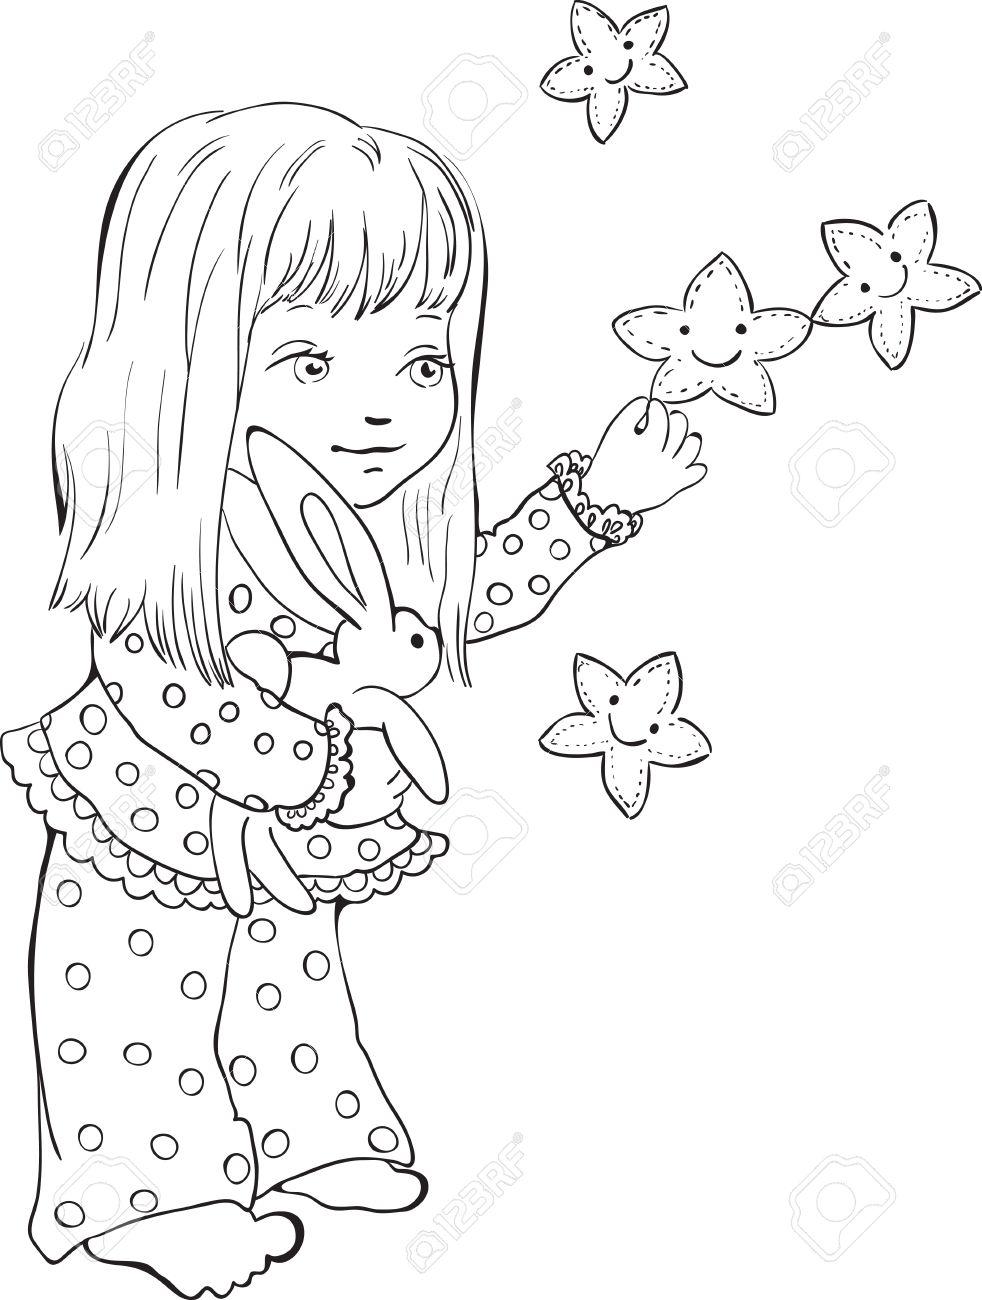 Niña Linda Con Estrellas Divertido. Sello Digital. Vector De Dibujo ...